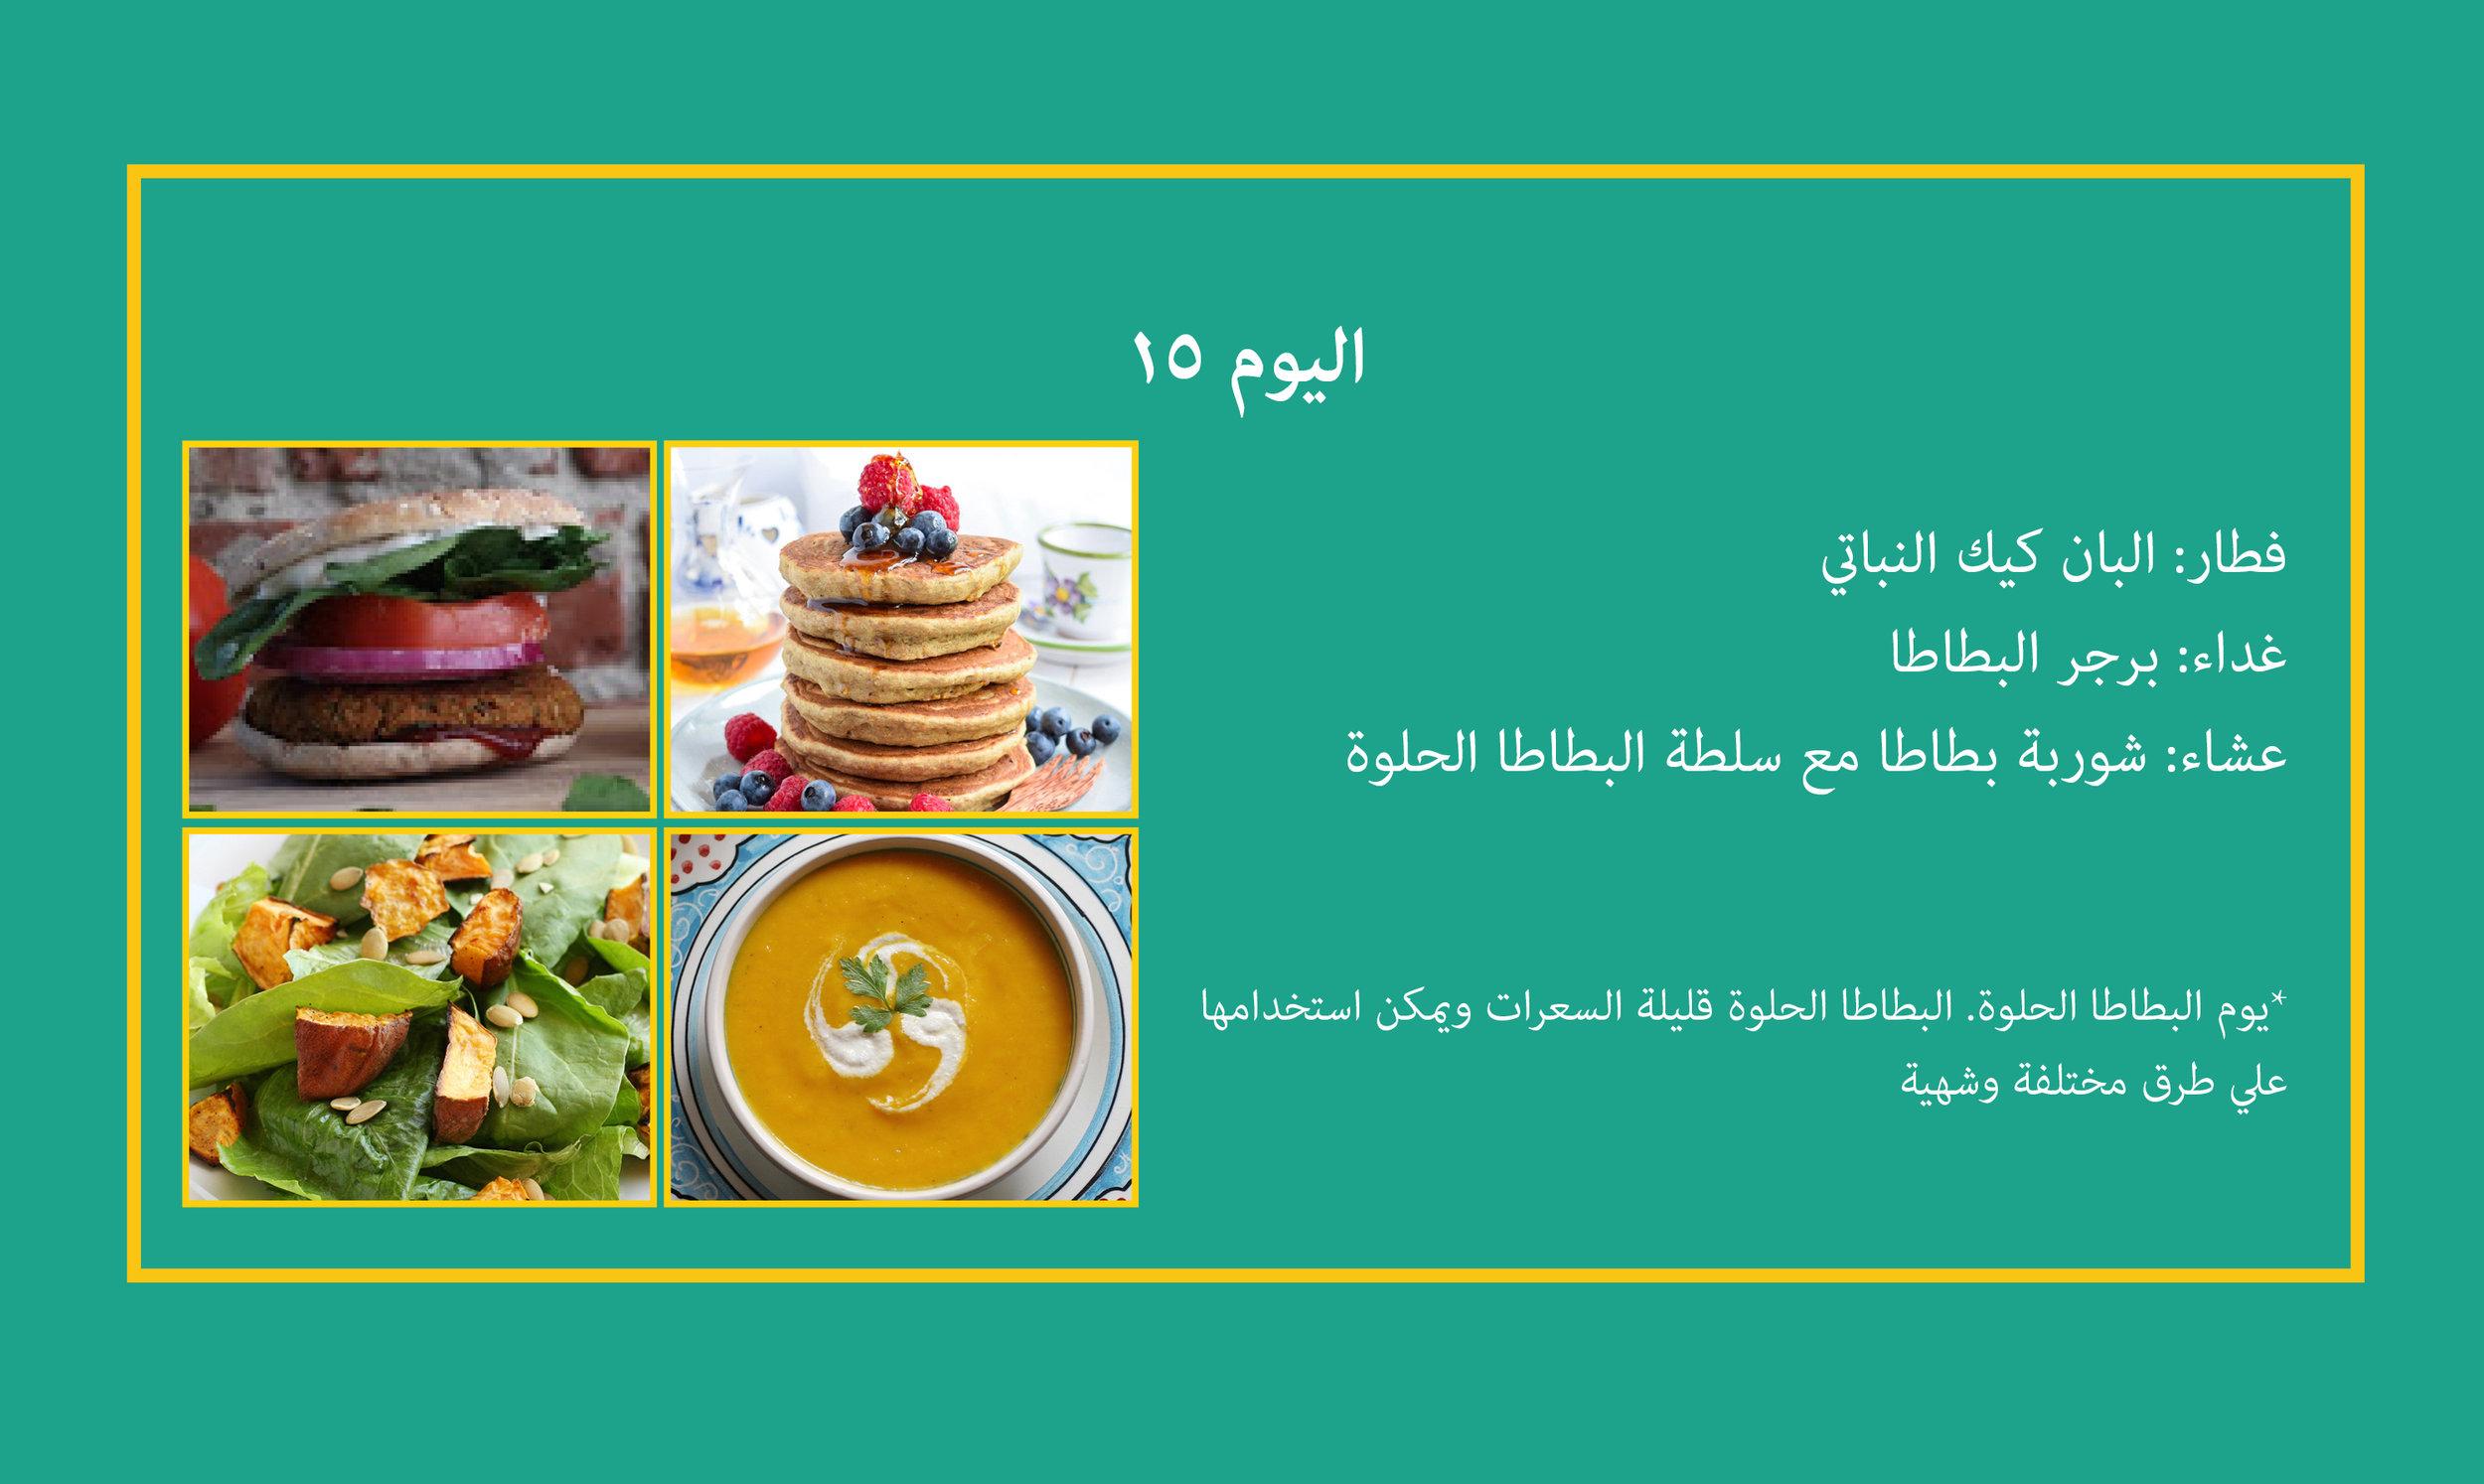 Day 15 Arabic.jpg